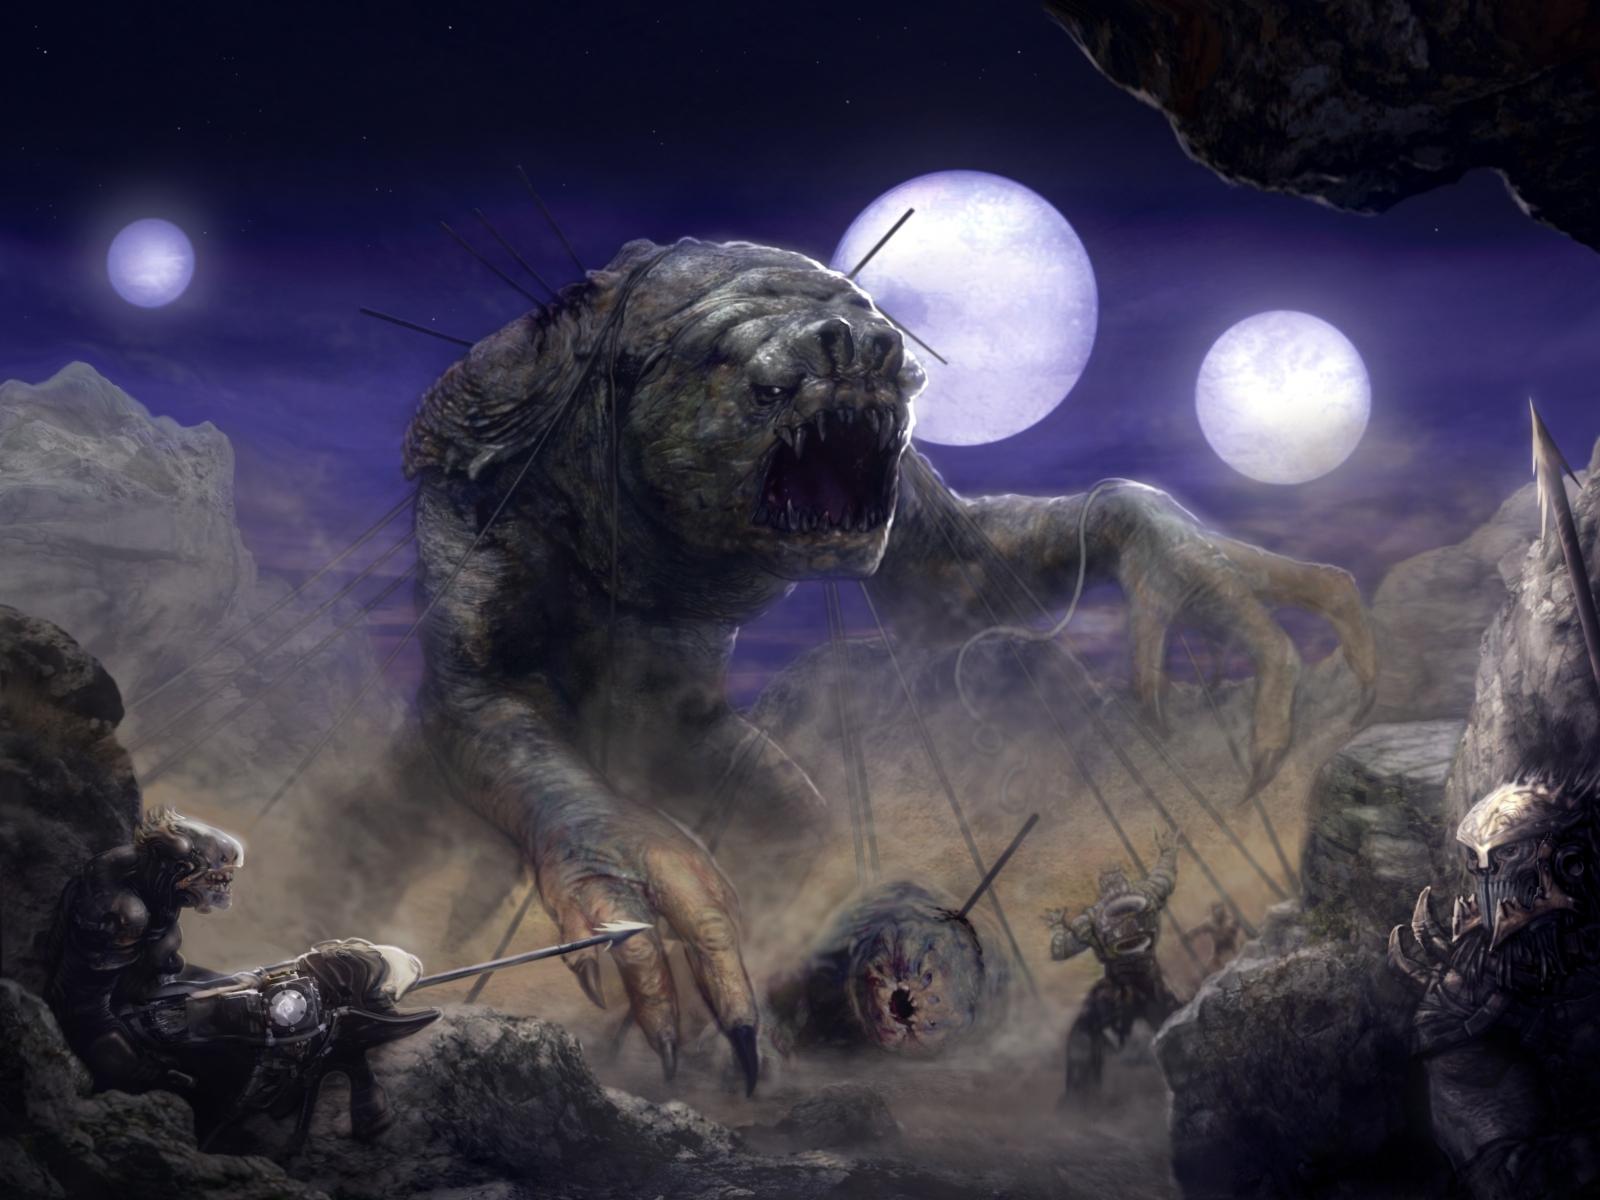 star wars landscapes movies night moon science fiction artwork rancor 1600x1200